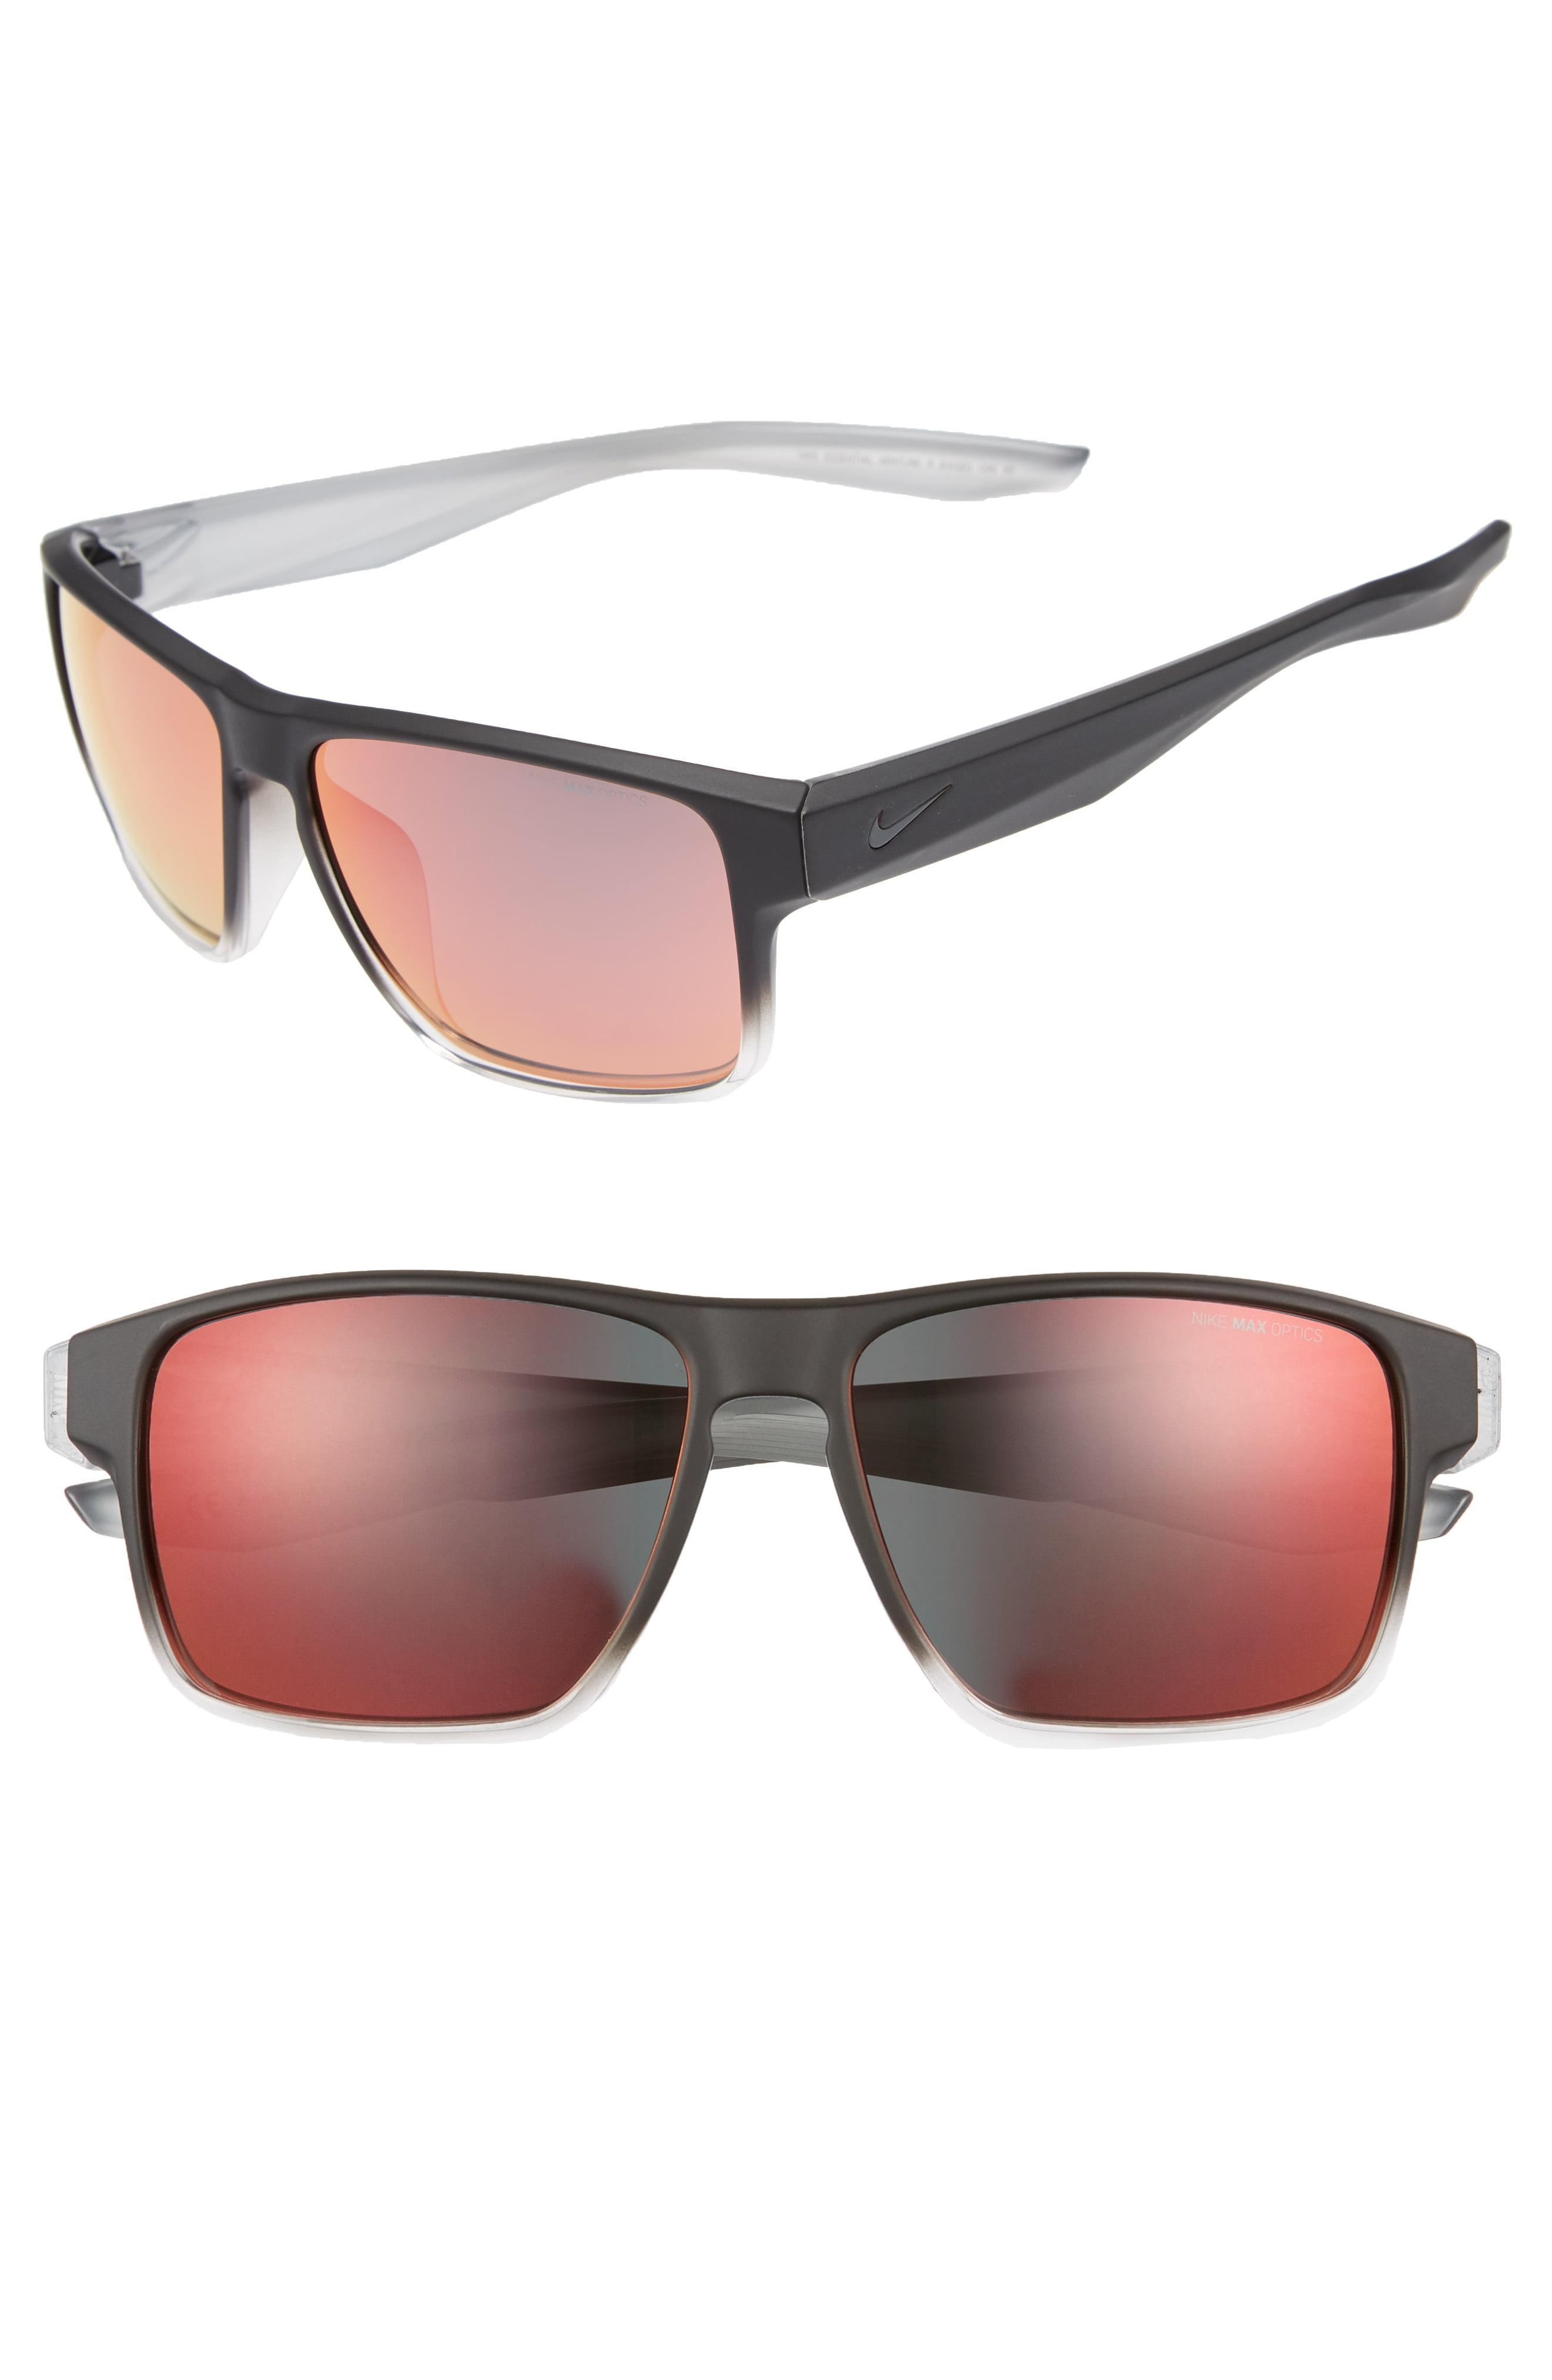 c3ea6cc72a08 Lyst - Nike Essential Venture R 59mm Sunglasses in Black for Men